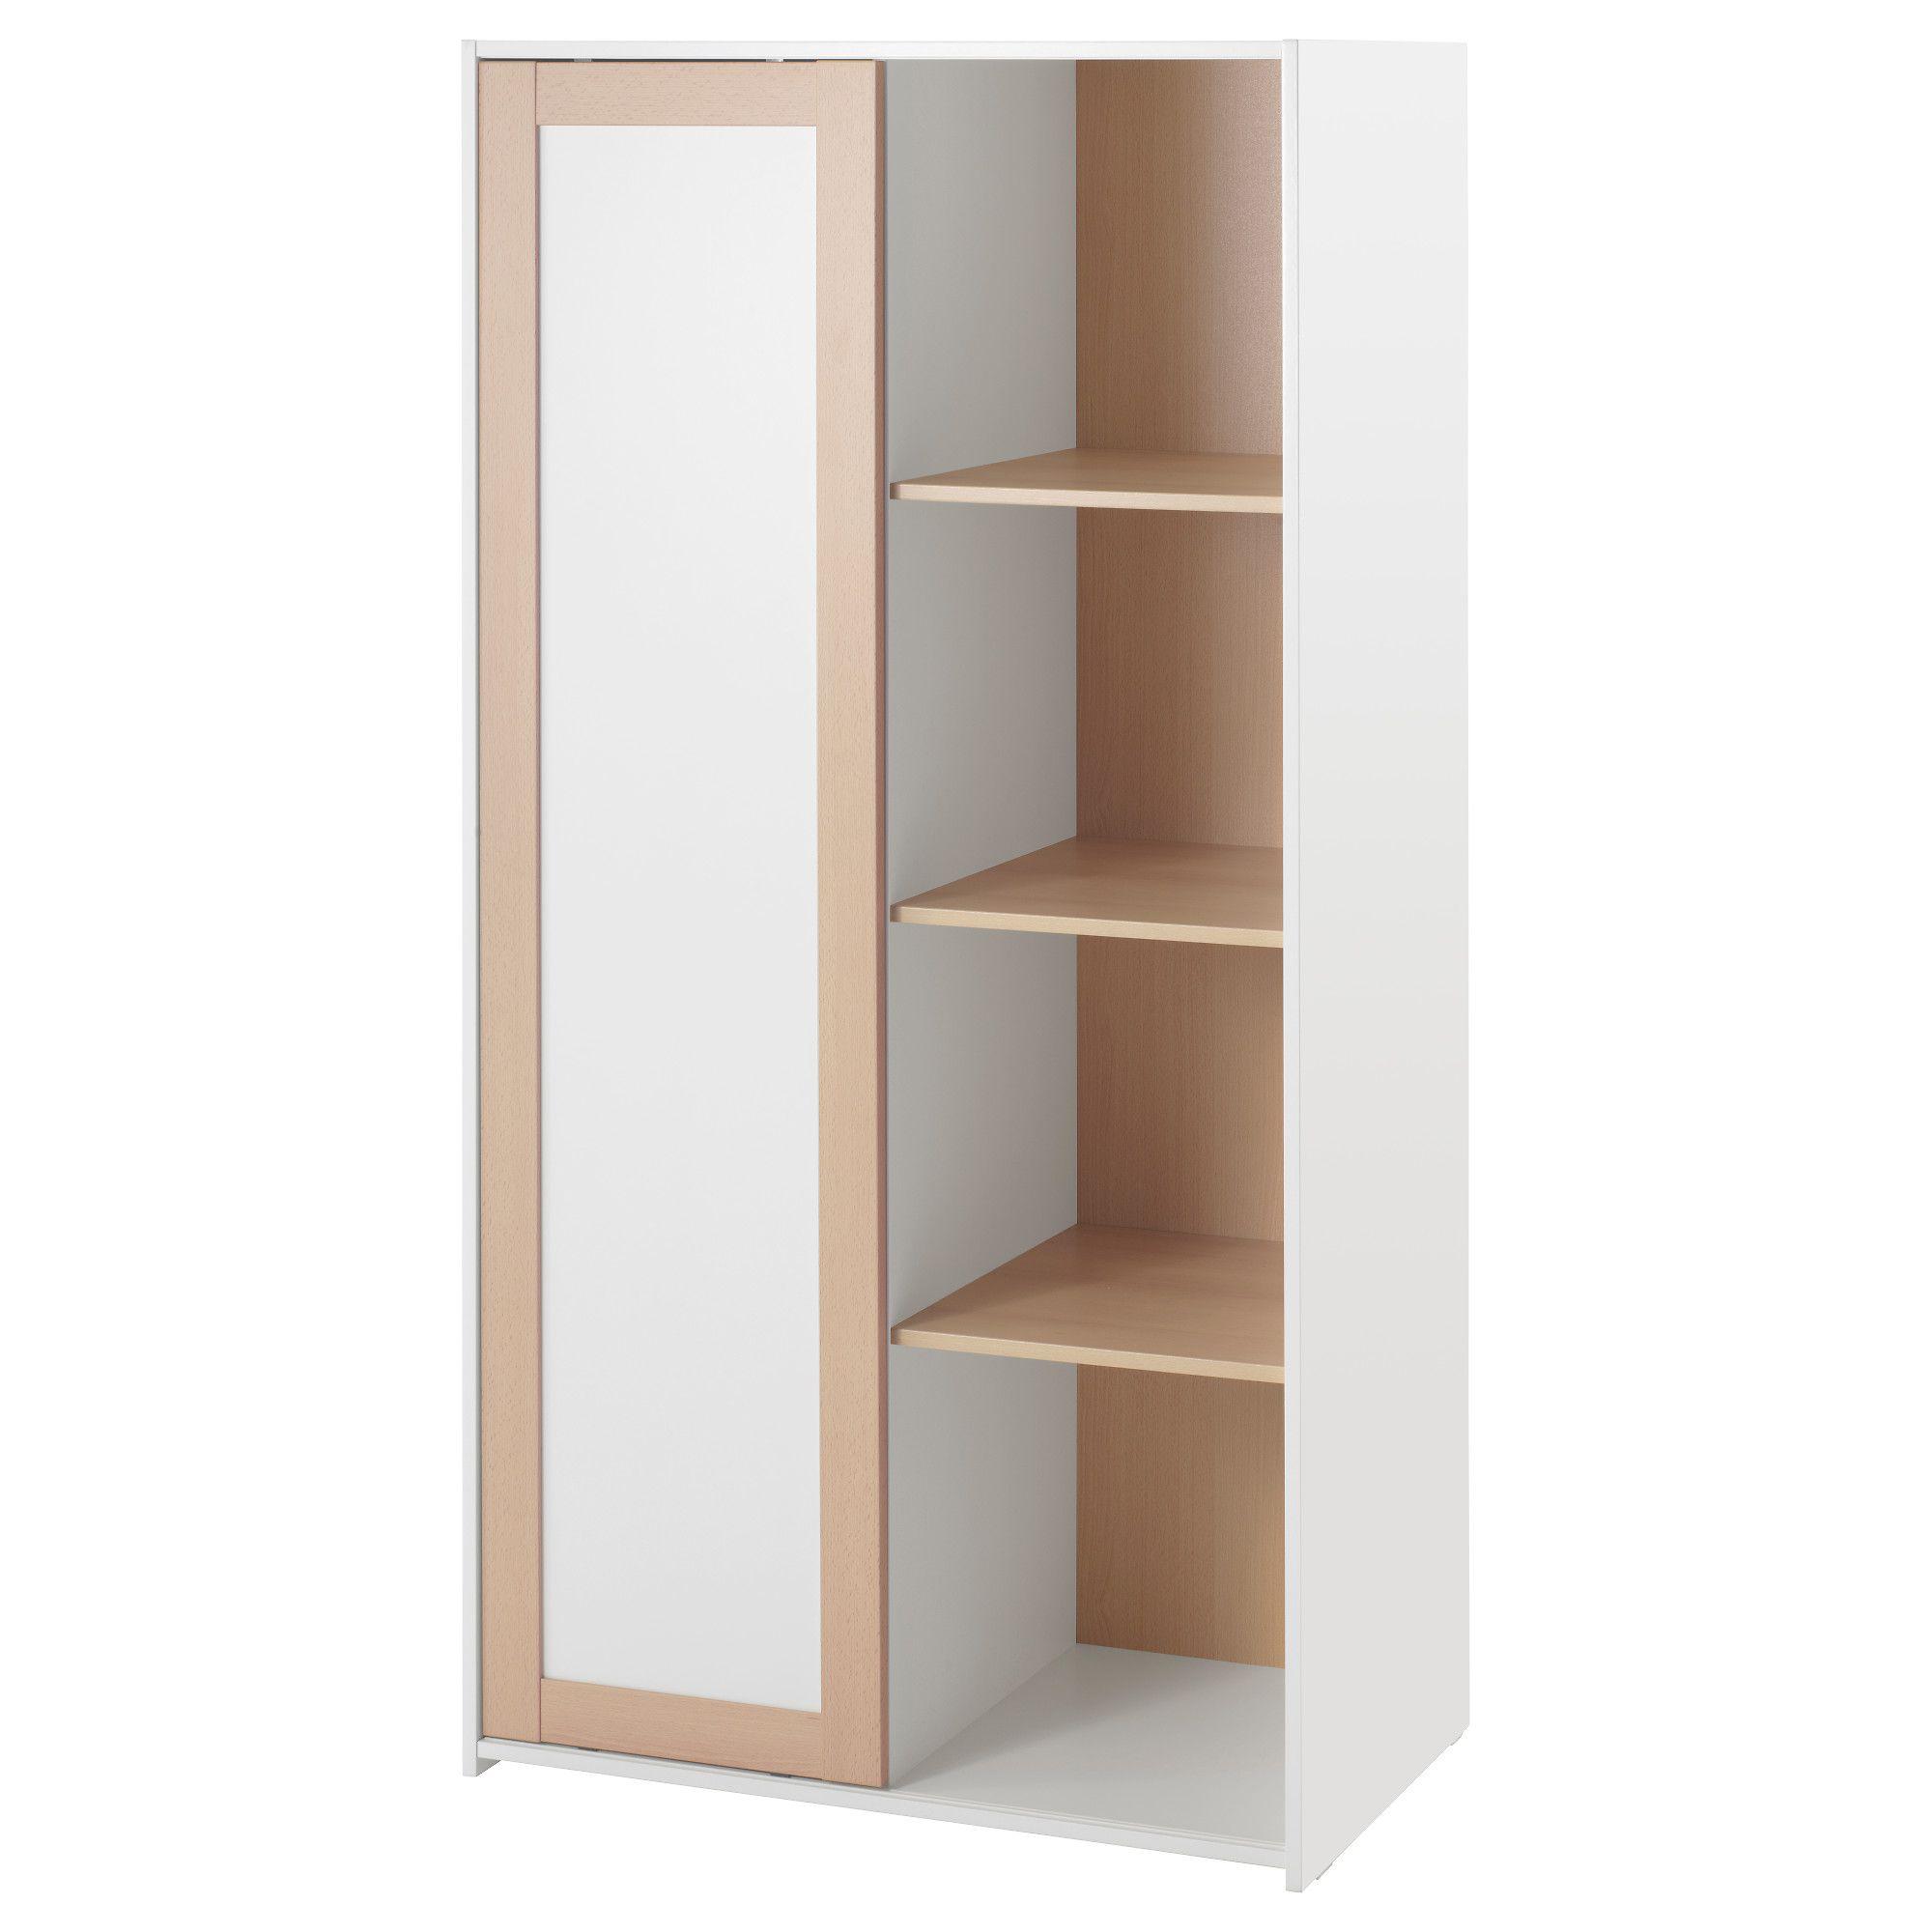 sniglar ikea deco ideas pinterest. Black Bedroom Furniture Sets. Home Design Ideas